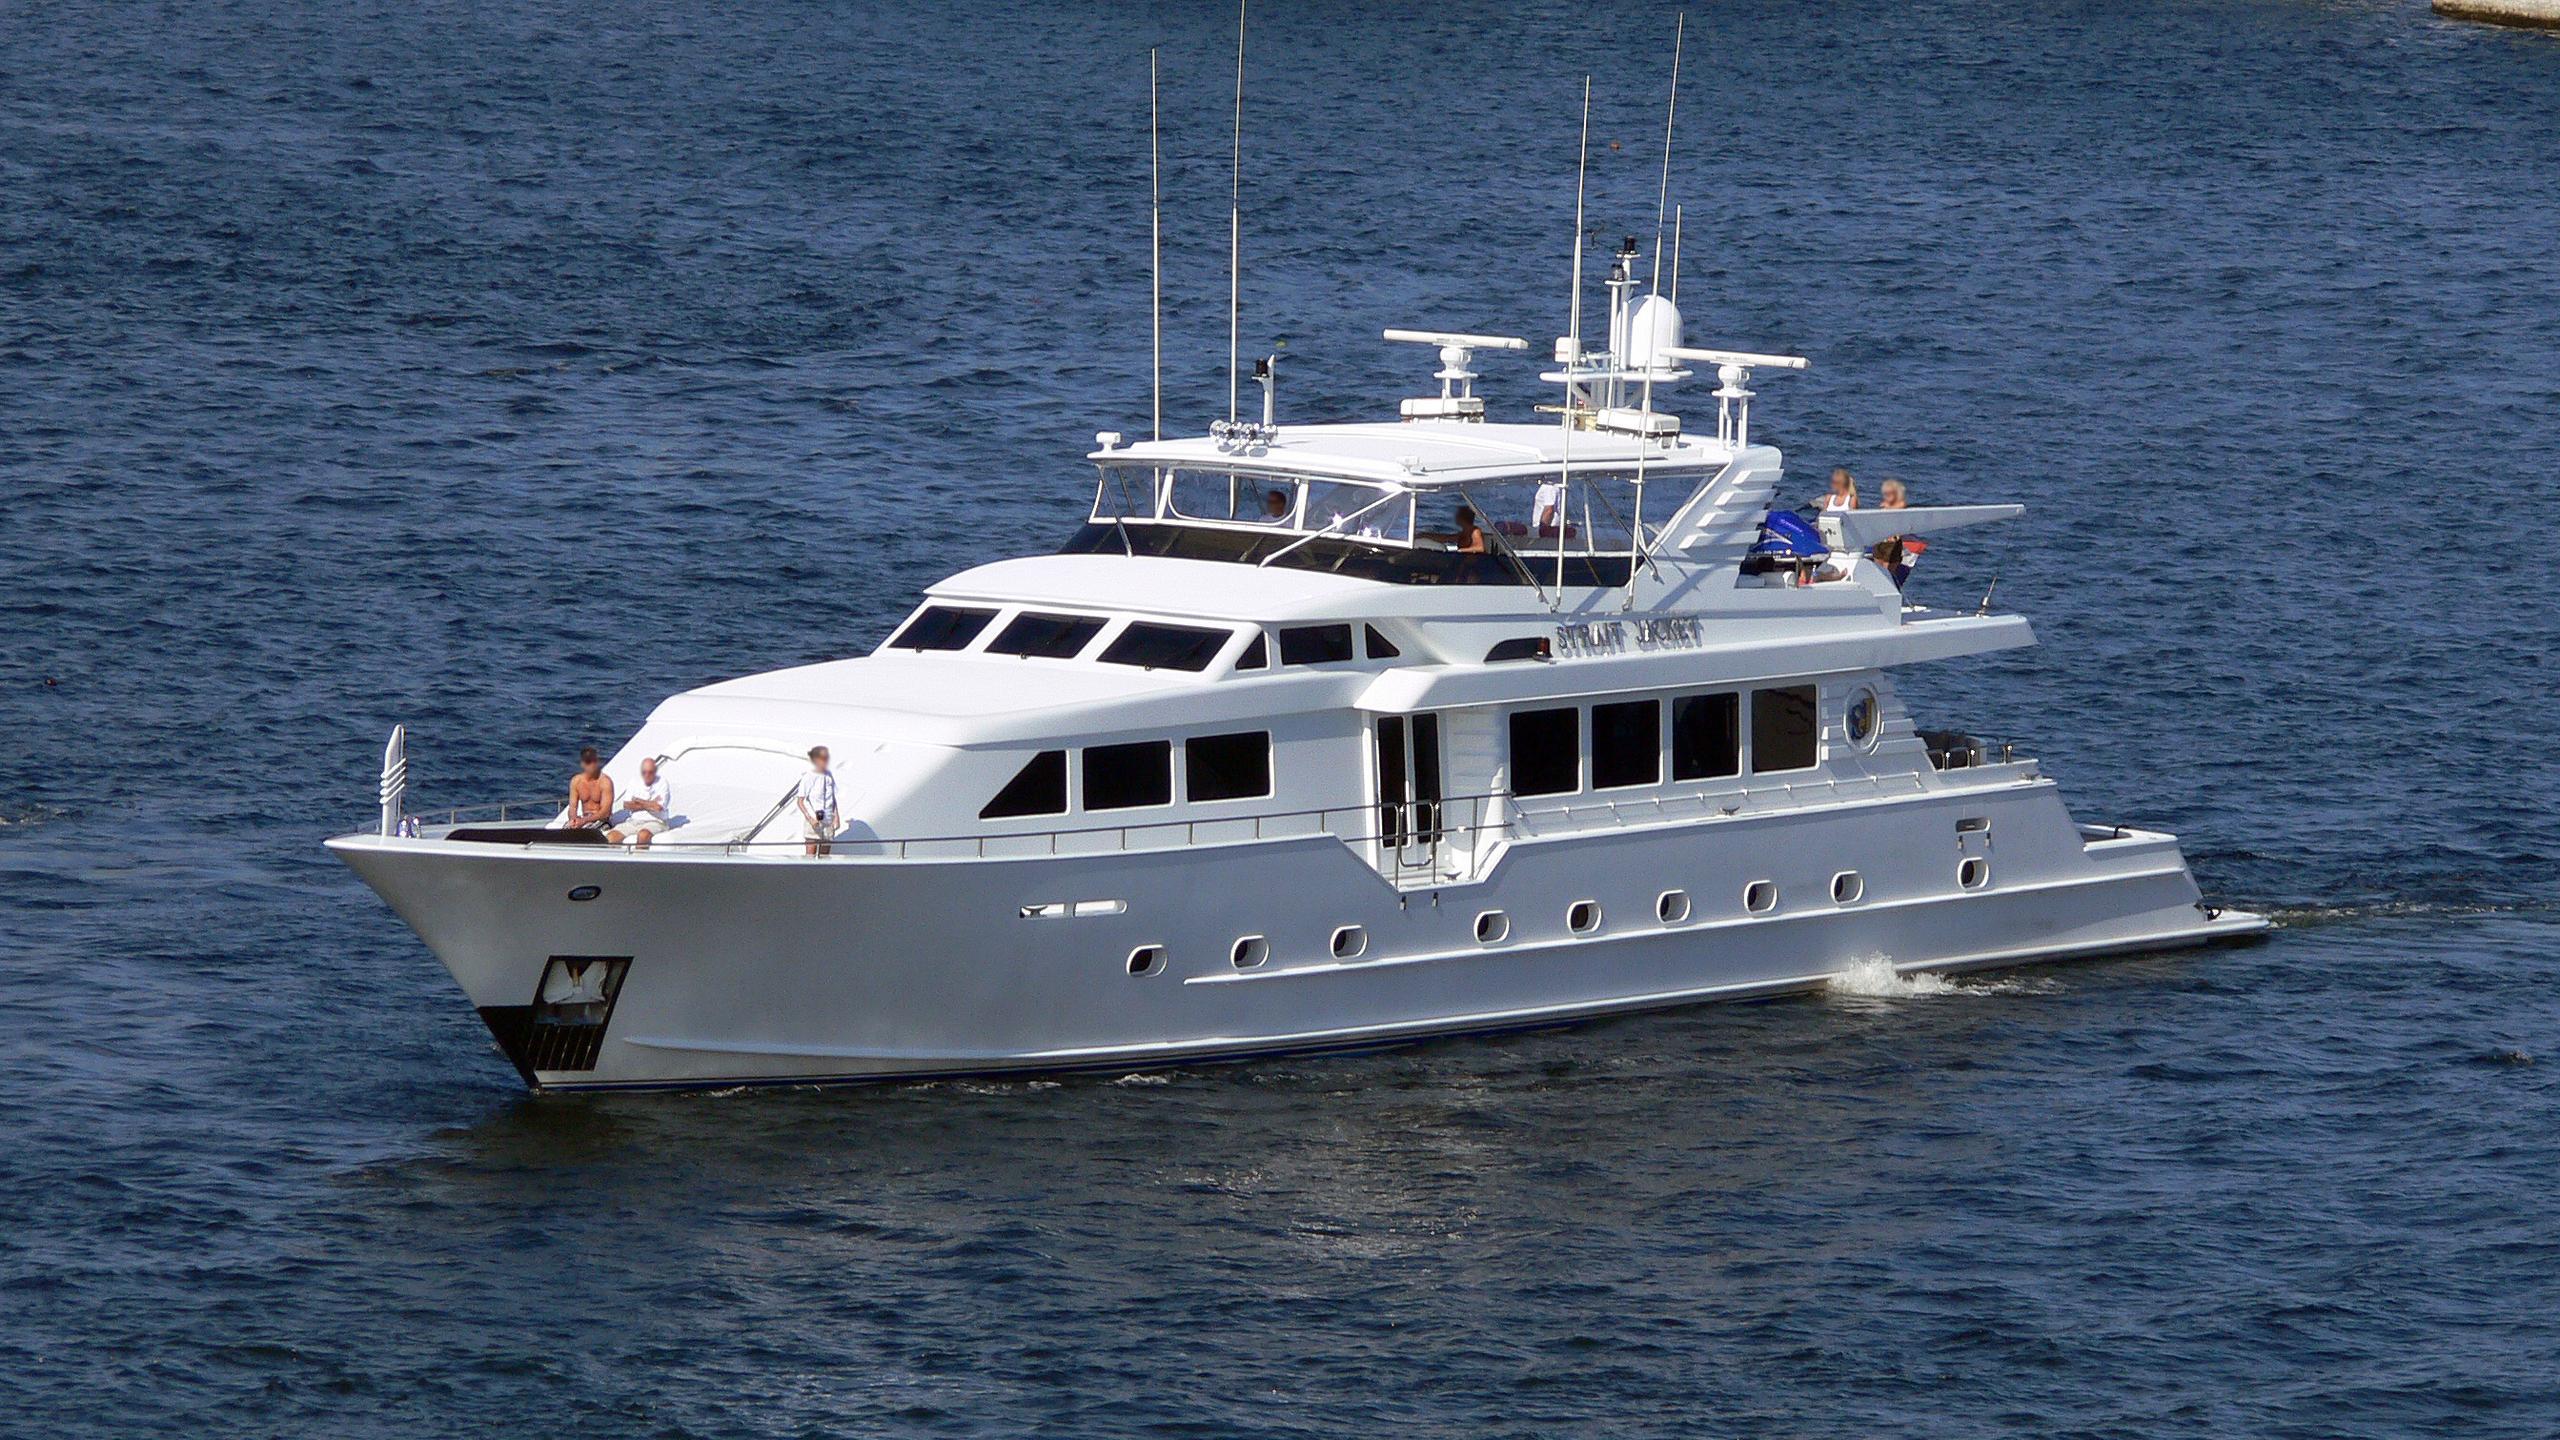 lady-sharon-gayle-motor-yacht-broward-1998-34m-profile